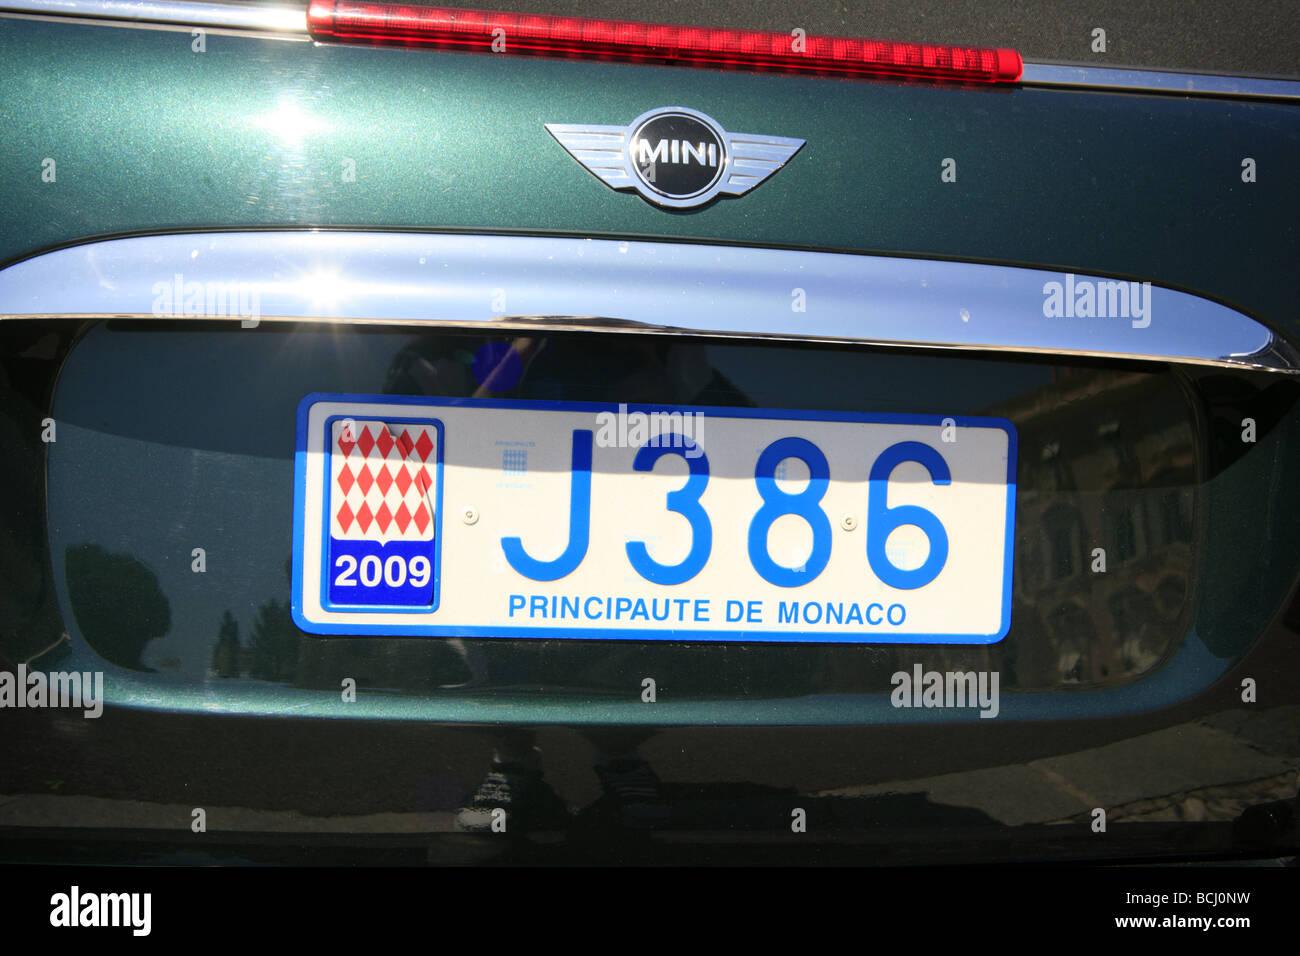 Principality of Monaco number plate - Stock Image